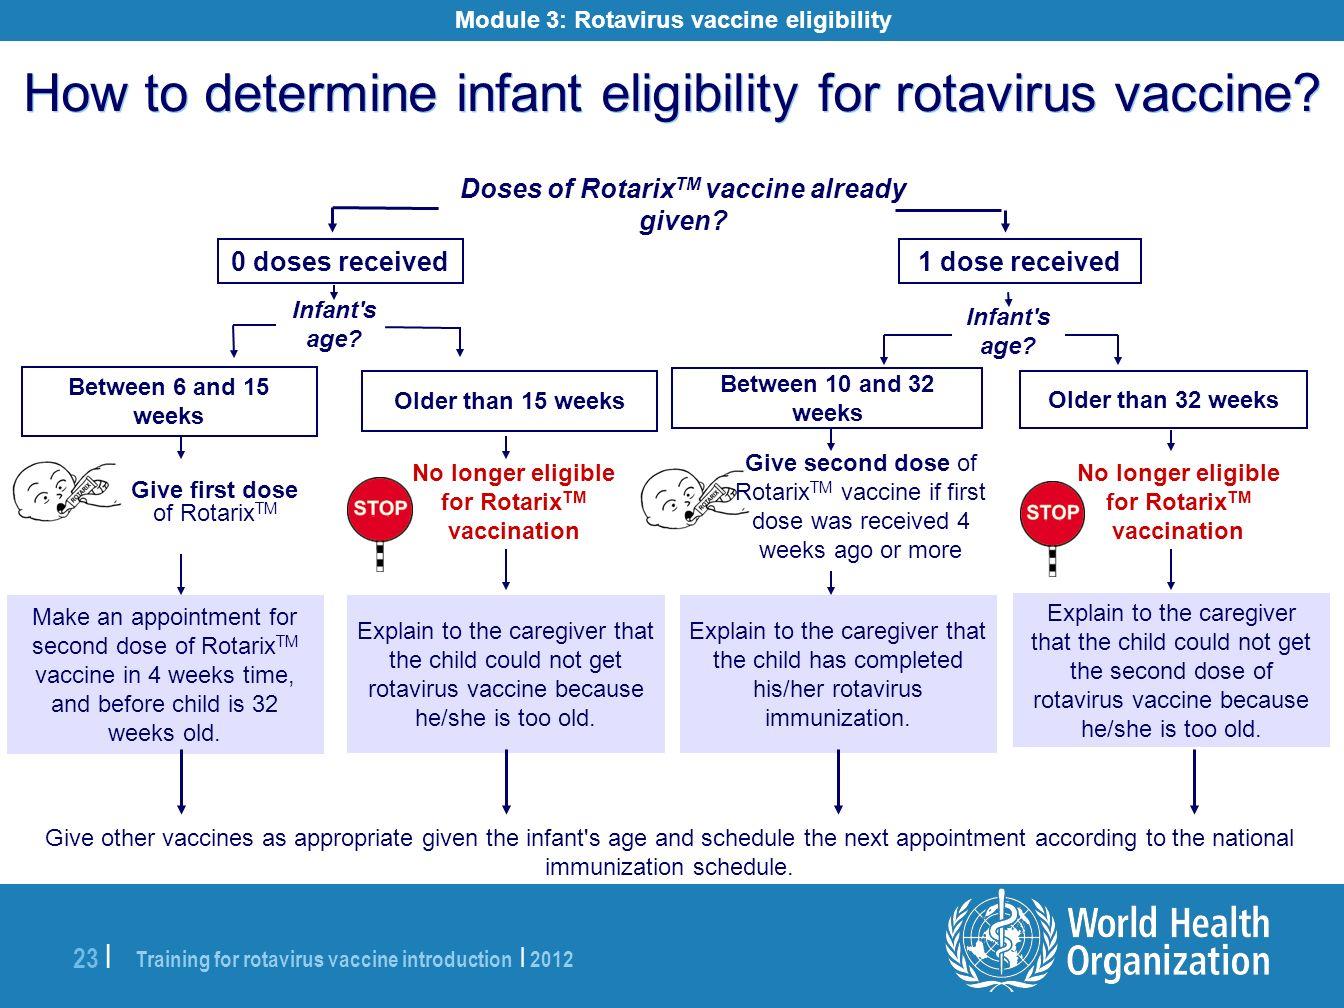 How to determine infant eligibility for rotavirus vaccine